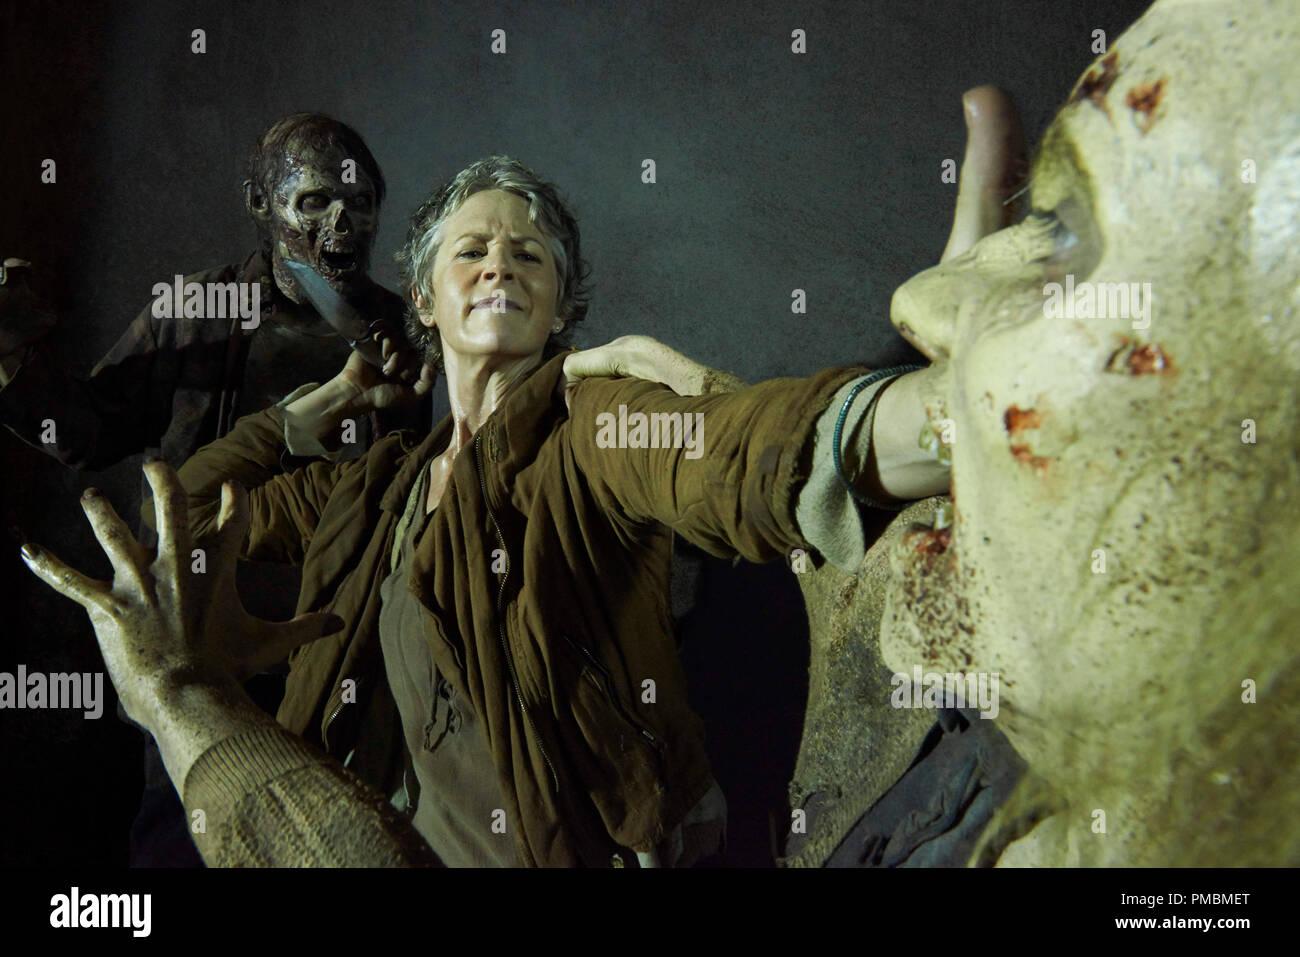 Melissa Mcbride The Walking Dead Season 5 Stock Photo